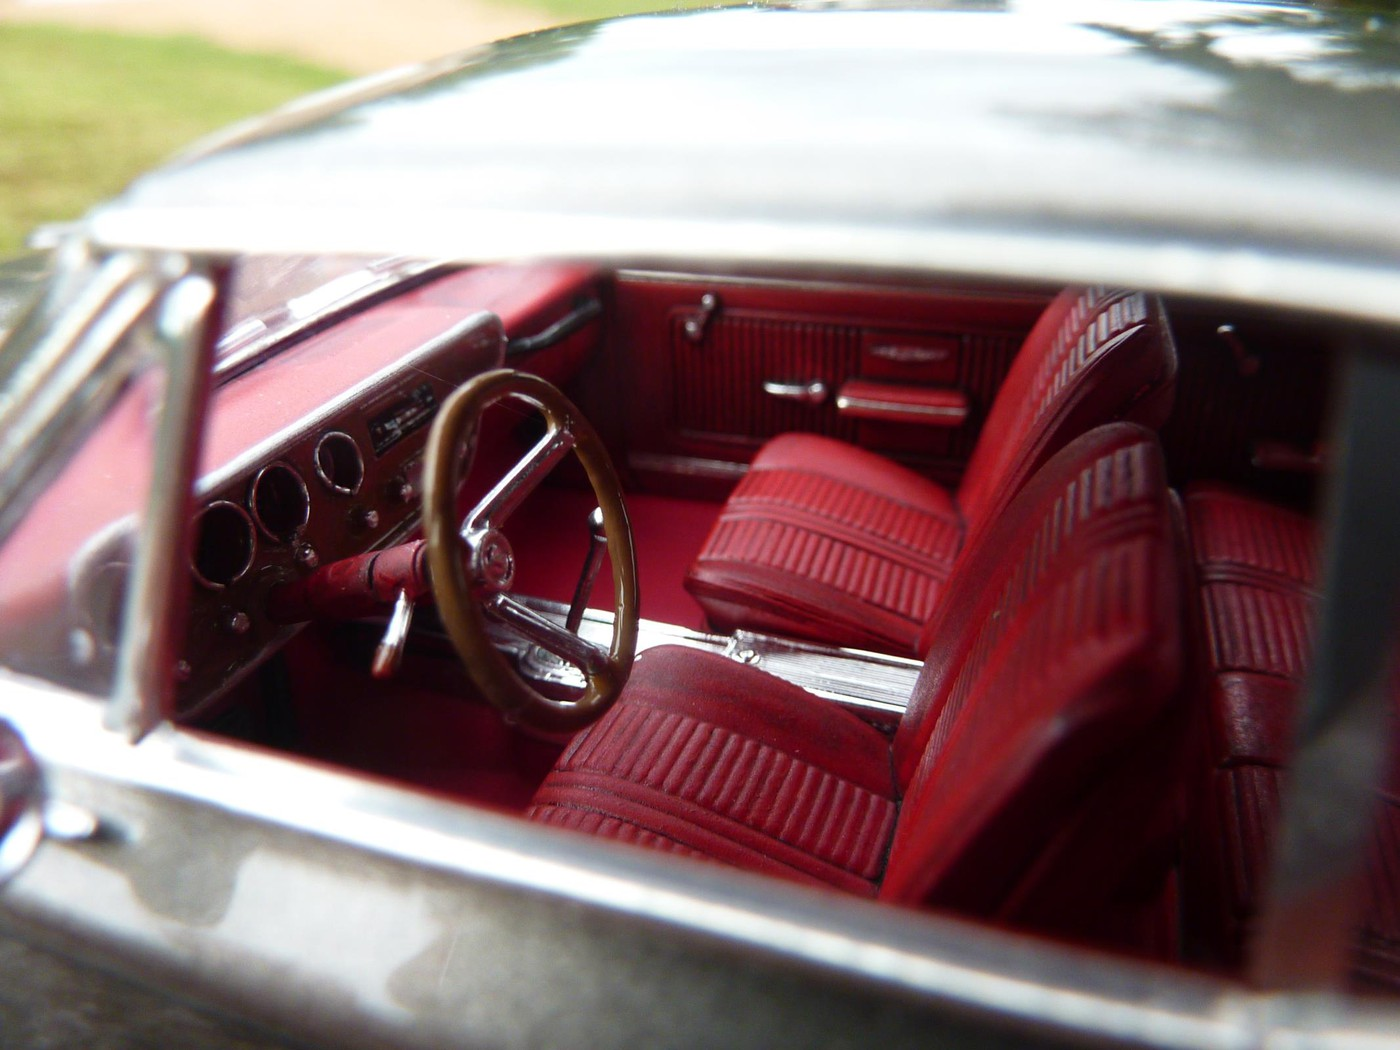 Chevrolet Impala 63 terminée - Page 2 Photo2-vi